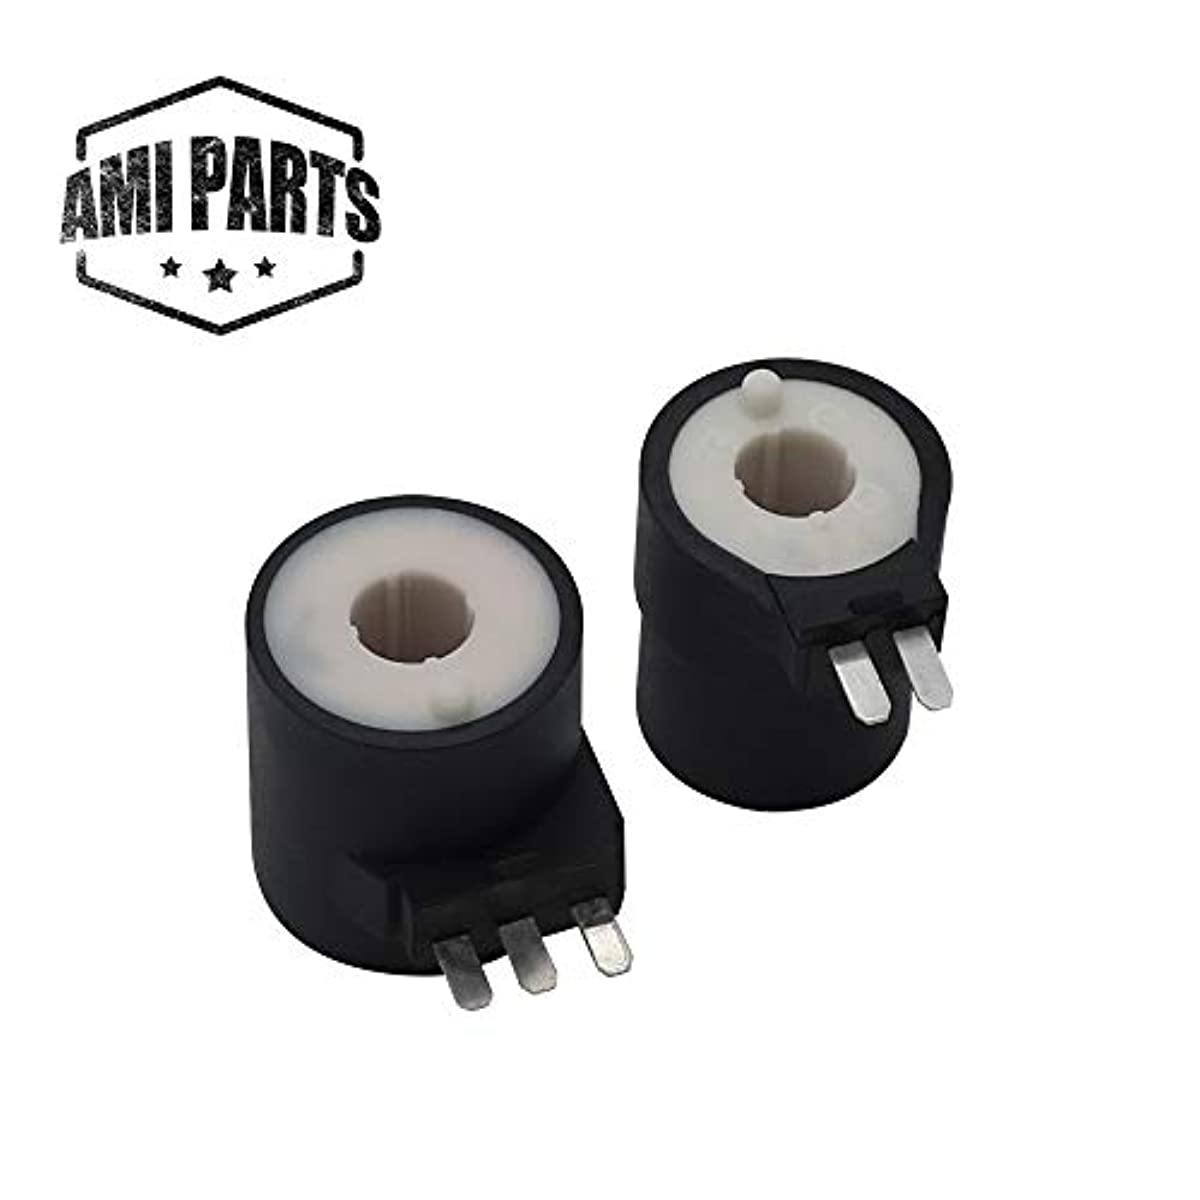 NEW 279834 Dryer Gas Valve Ignition Solenoid Coil Kit Fits KitchenAid